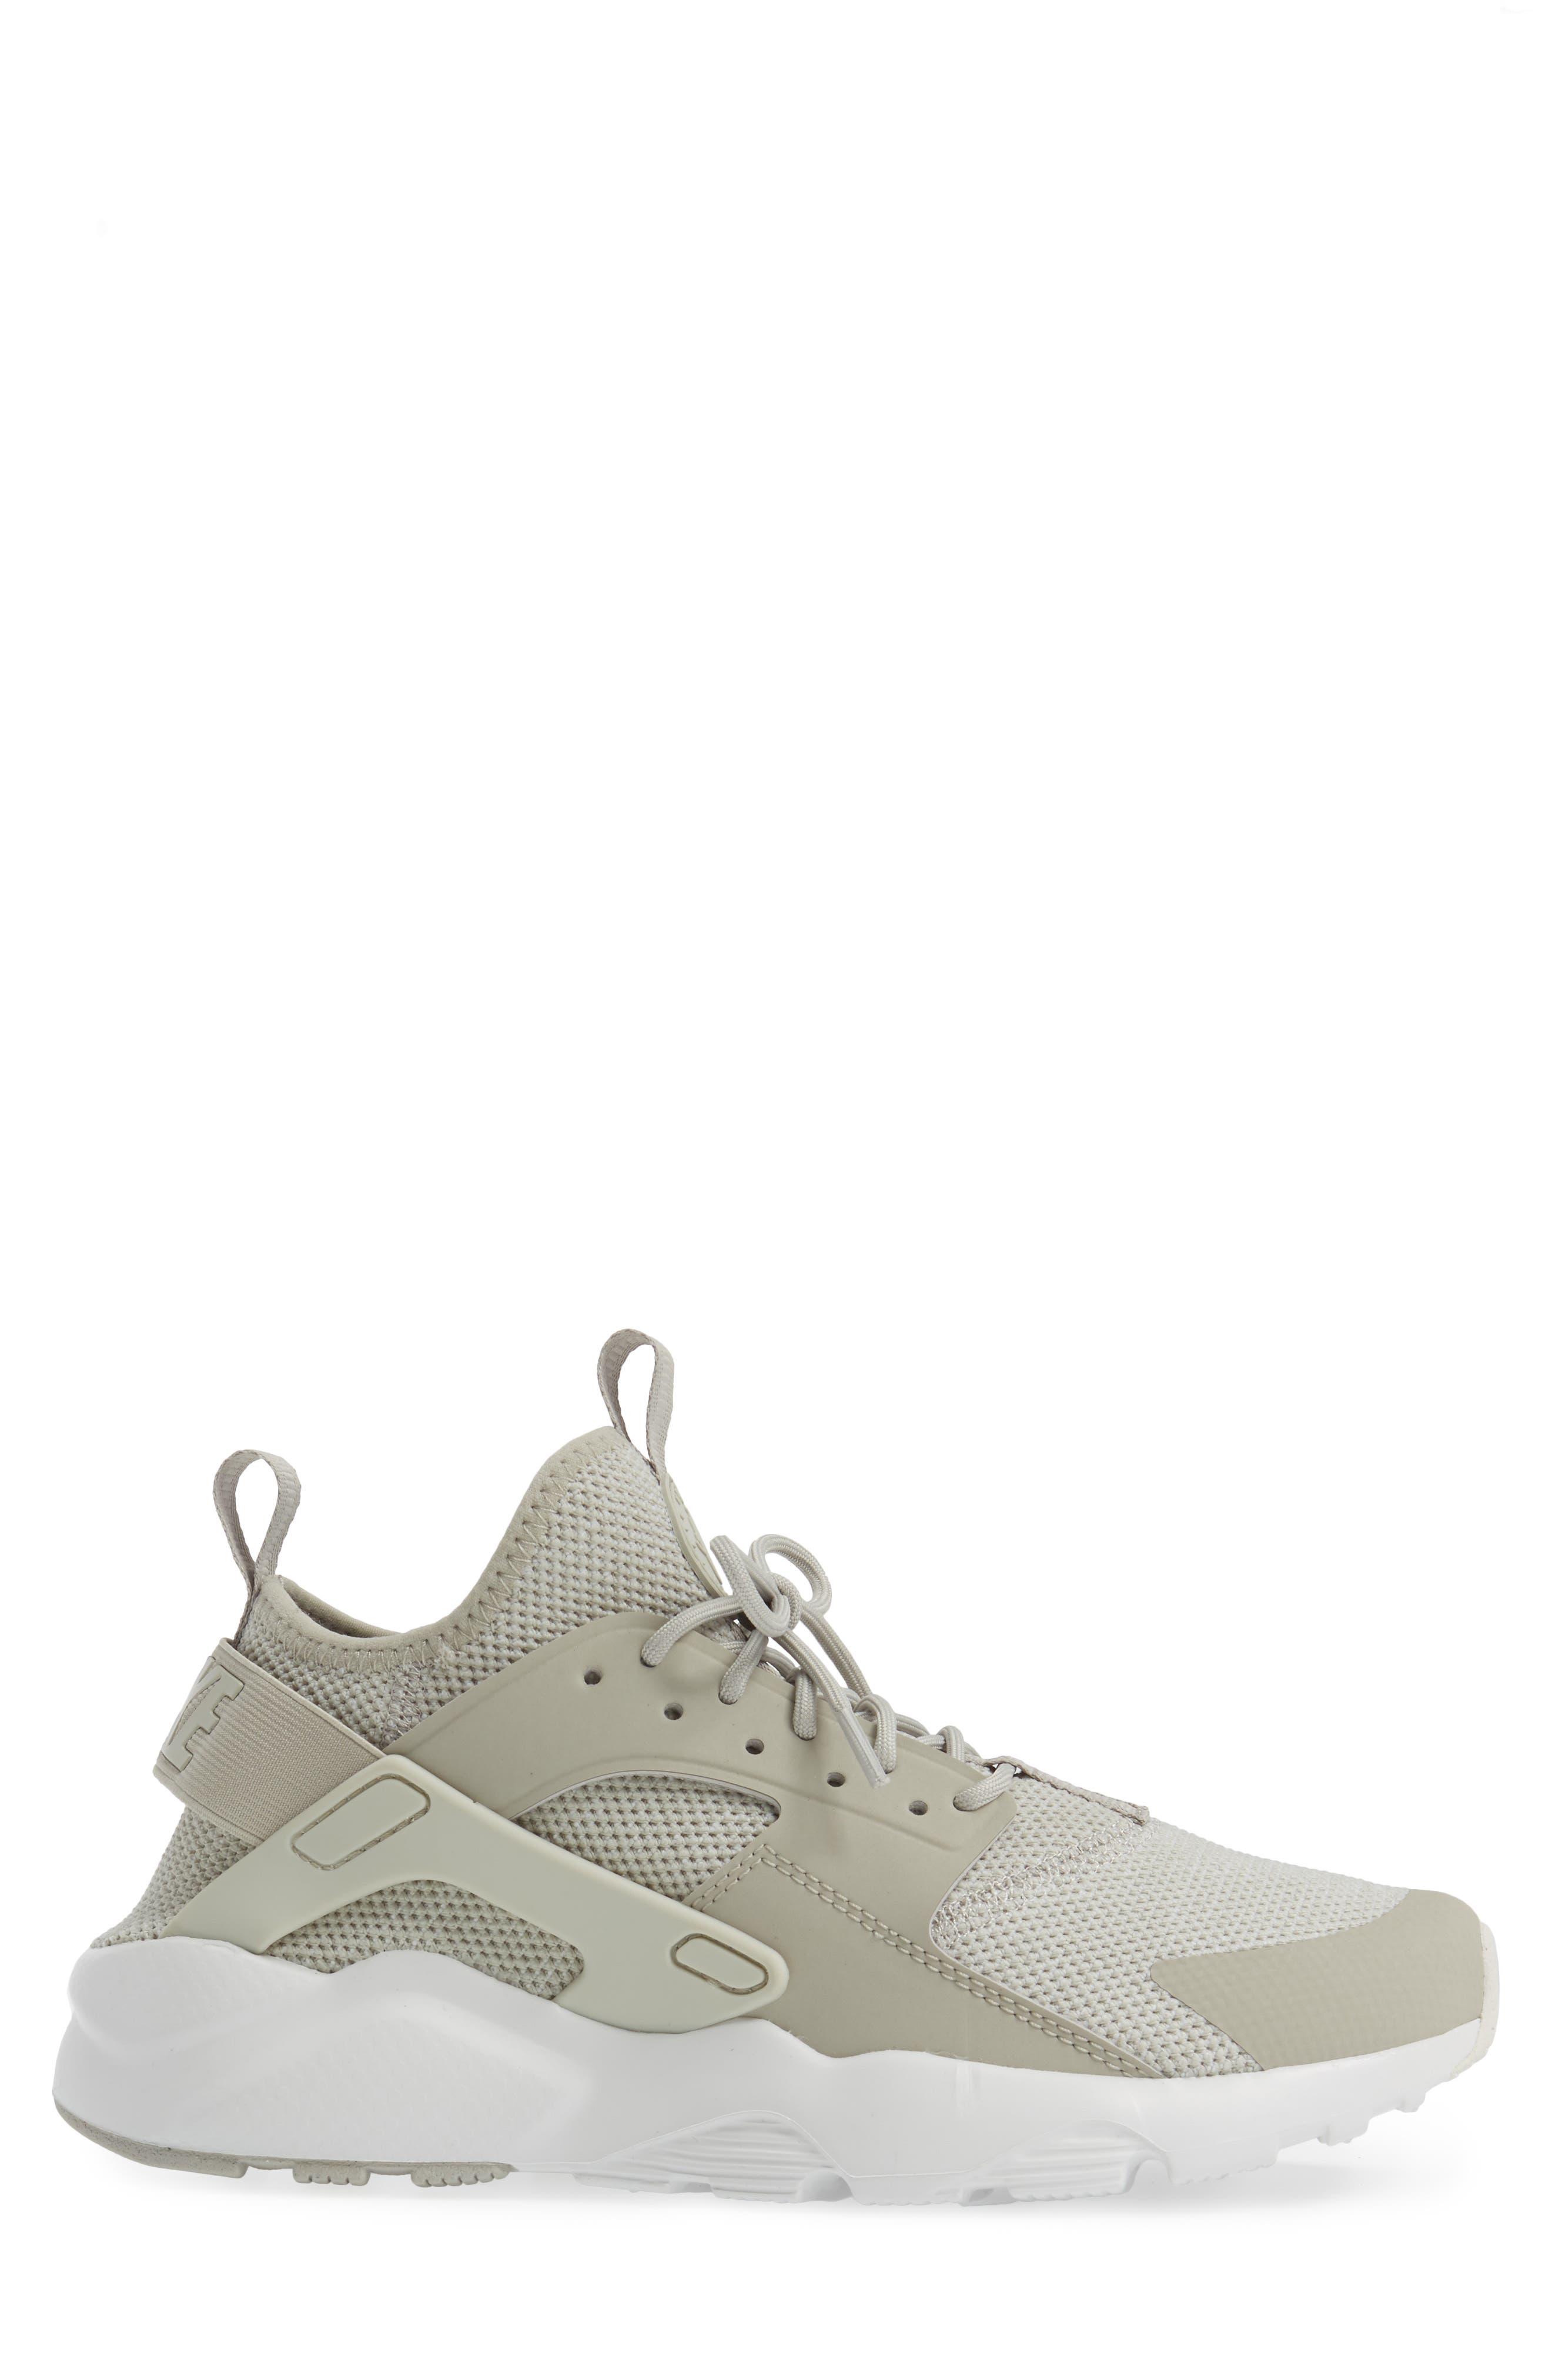 Alternate Image 3  - Nike Air Huarache Ultra Breathe Sneaker (Men)